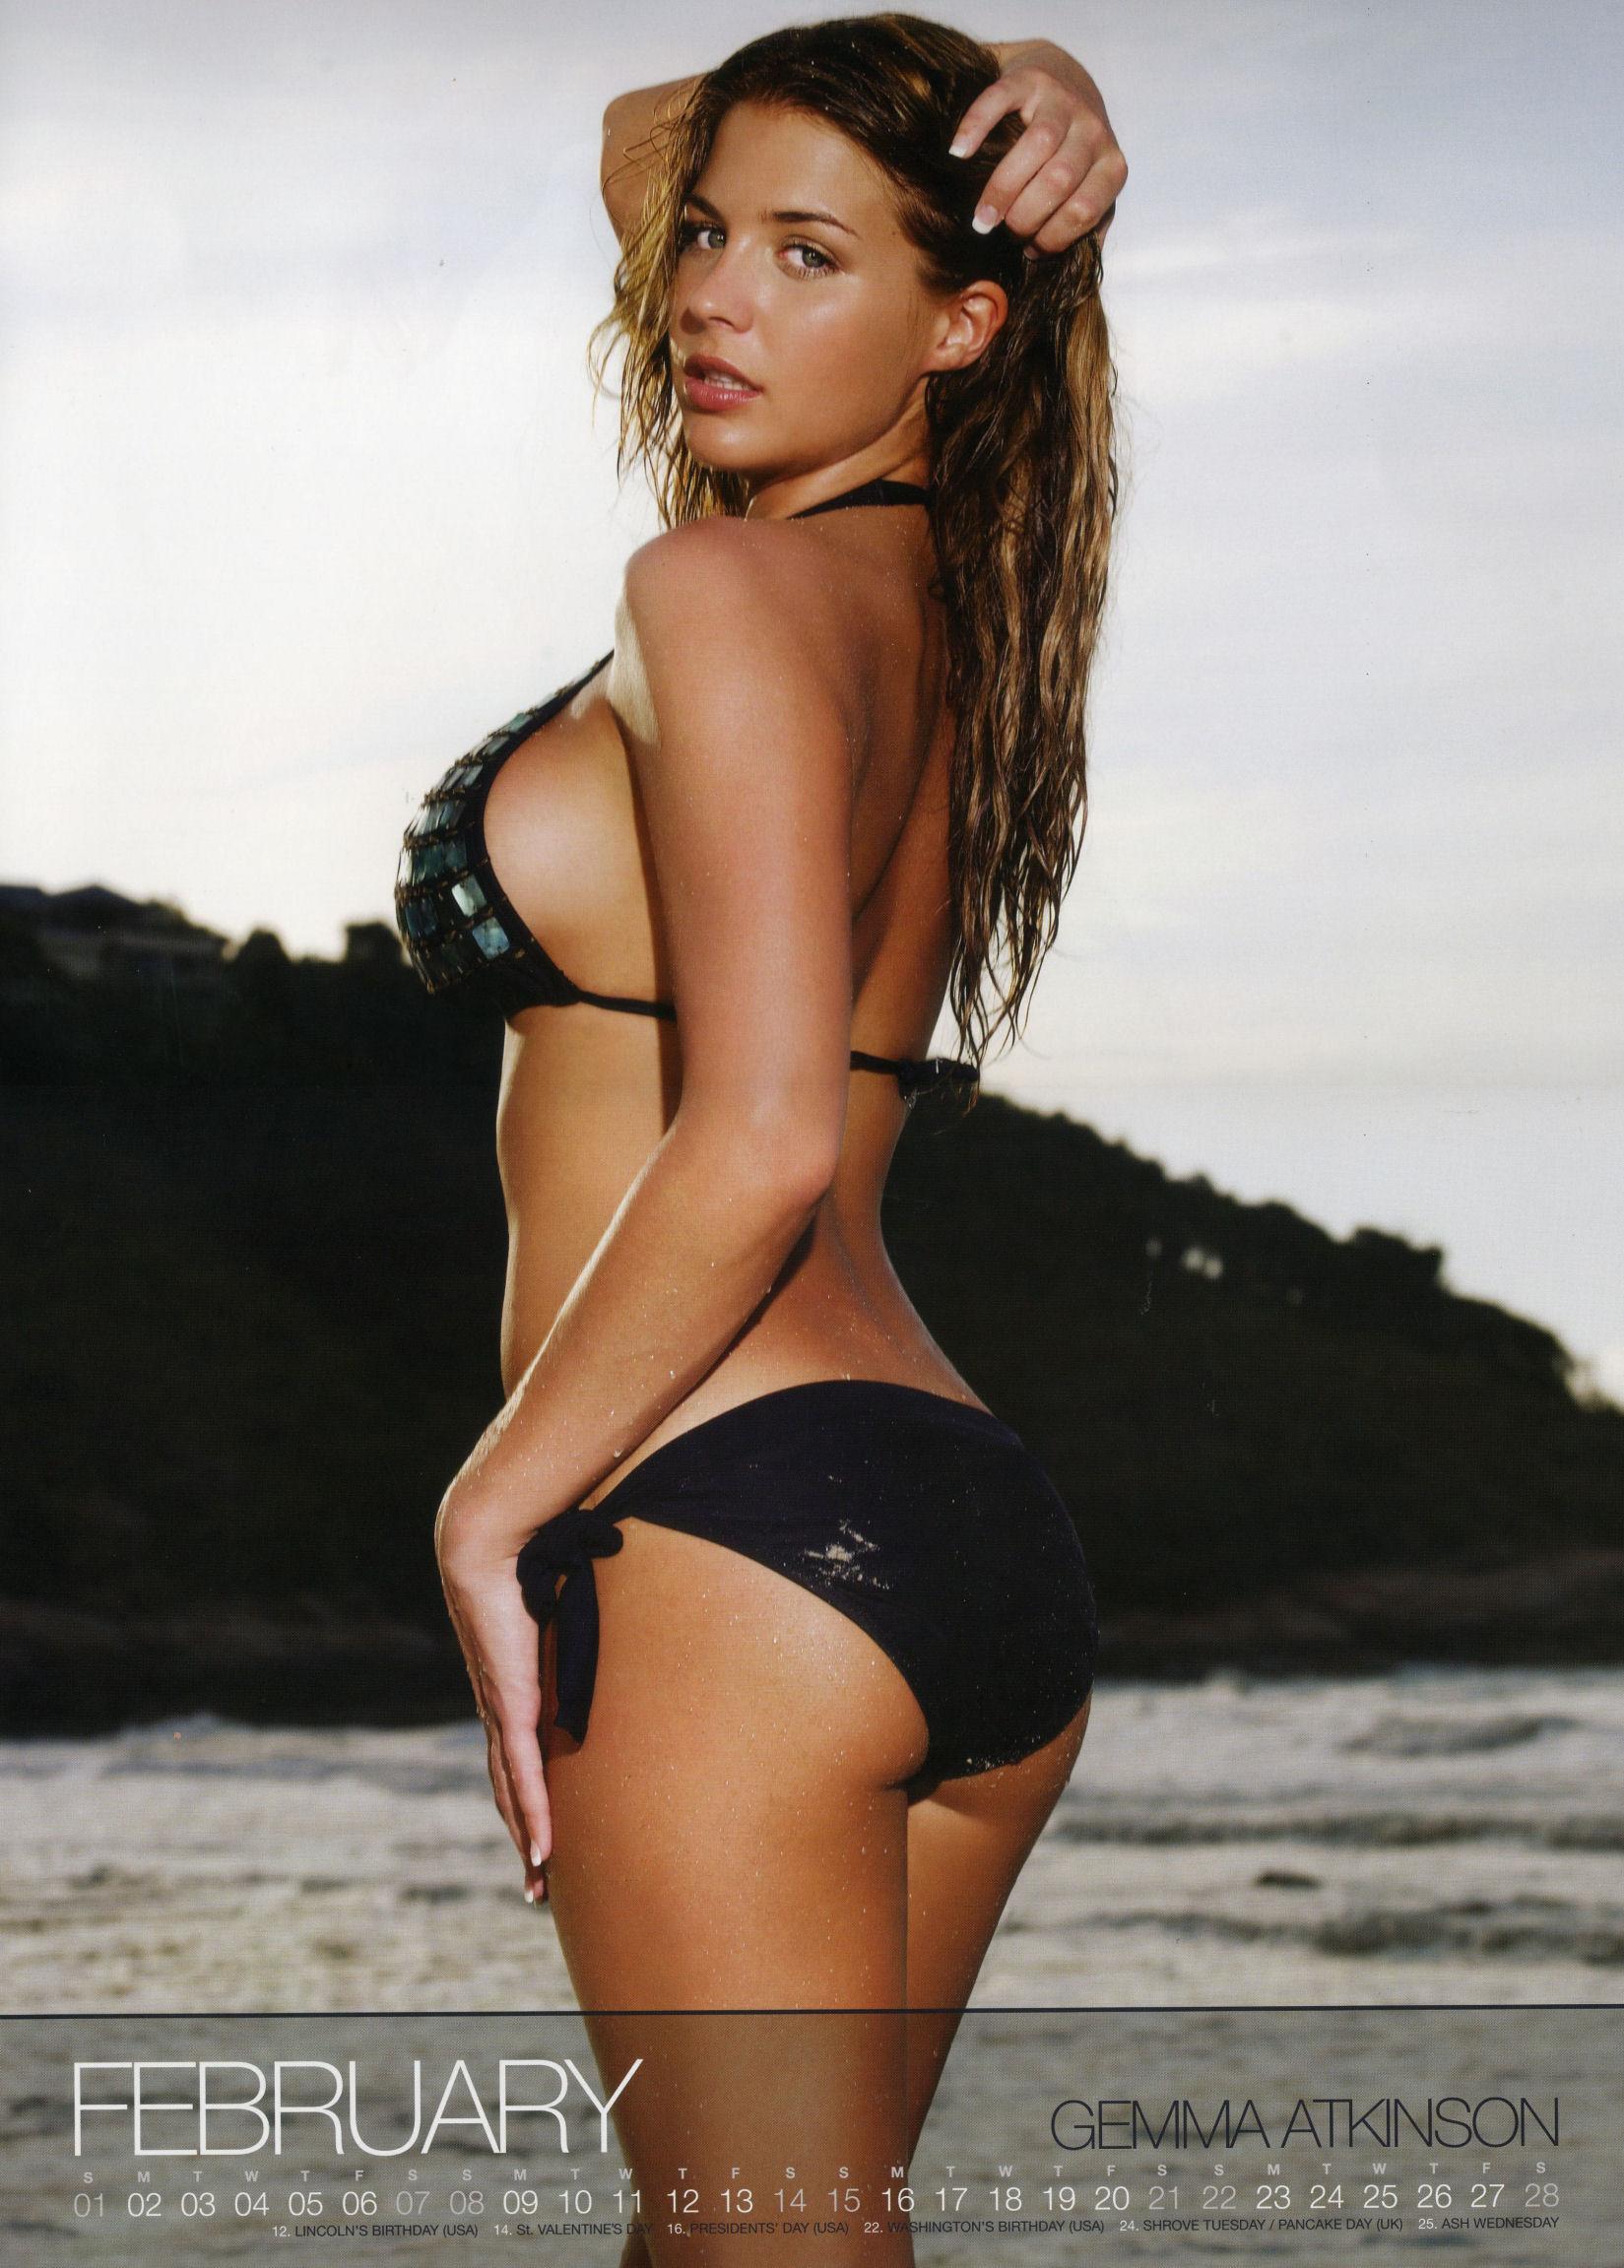 Bikini Kristanna Loken nudes (97 photo), Topless, Fappening, Feet, butt 2017